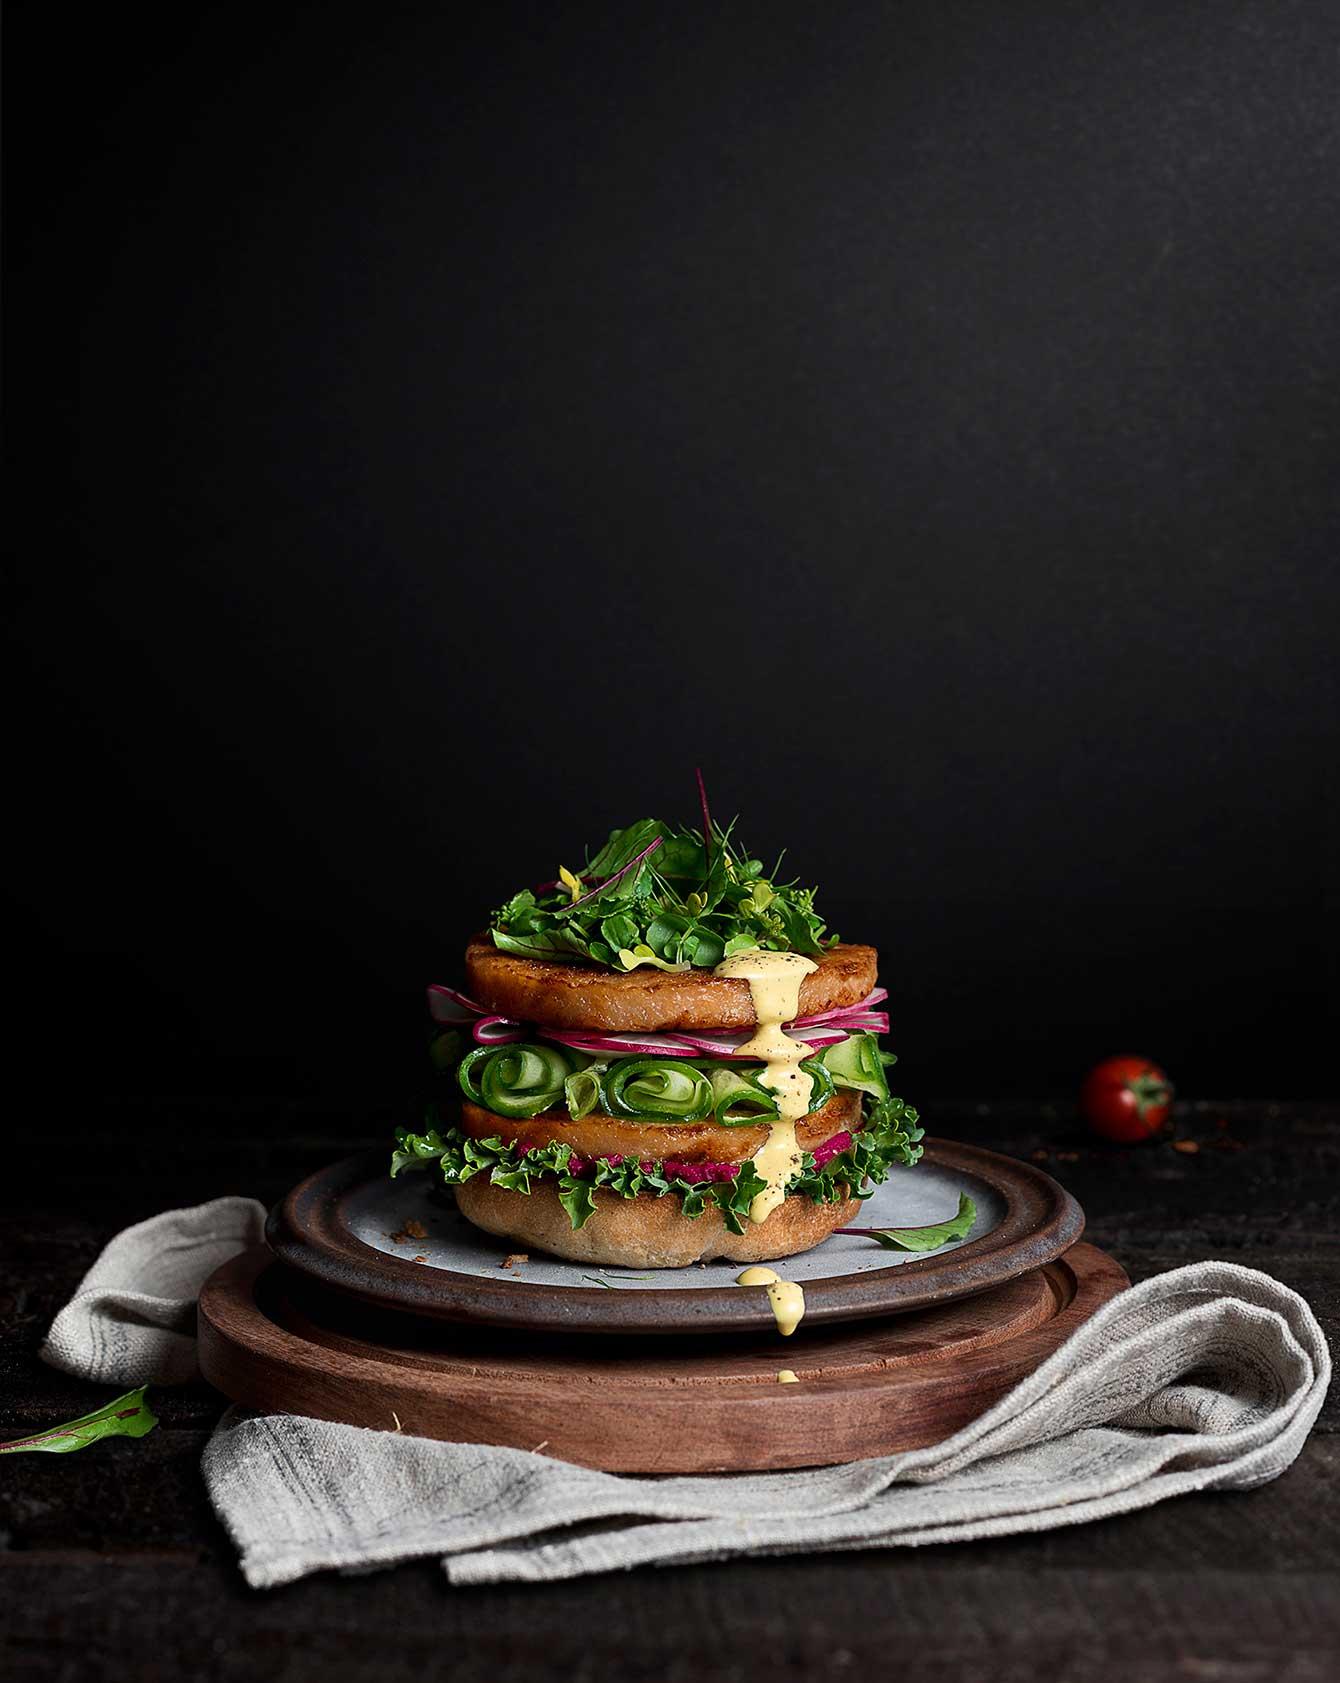 hamburguesa-soya-la-crianza-estudio-como